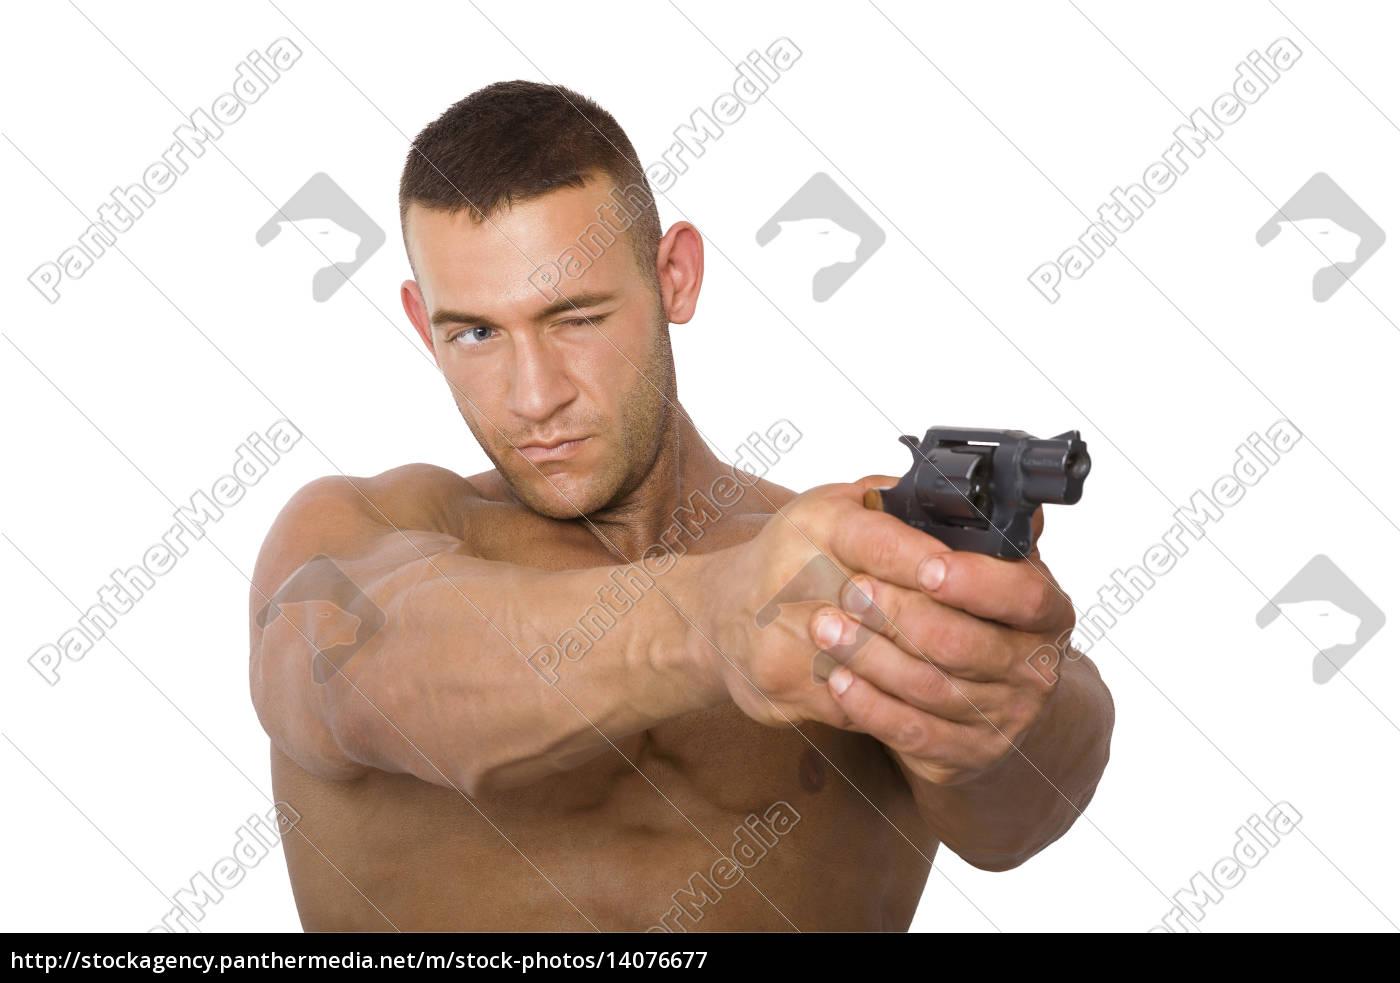 man, with, gun. - 14076677